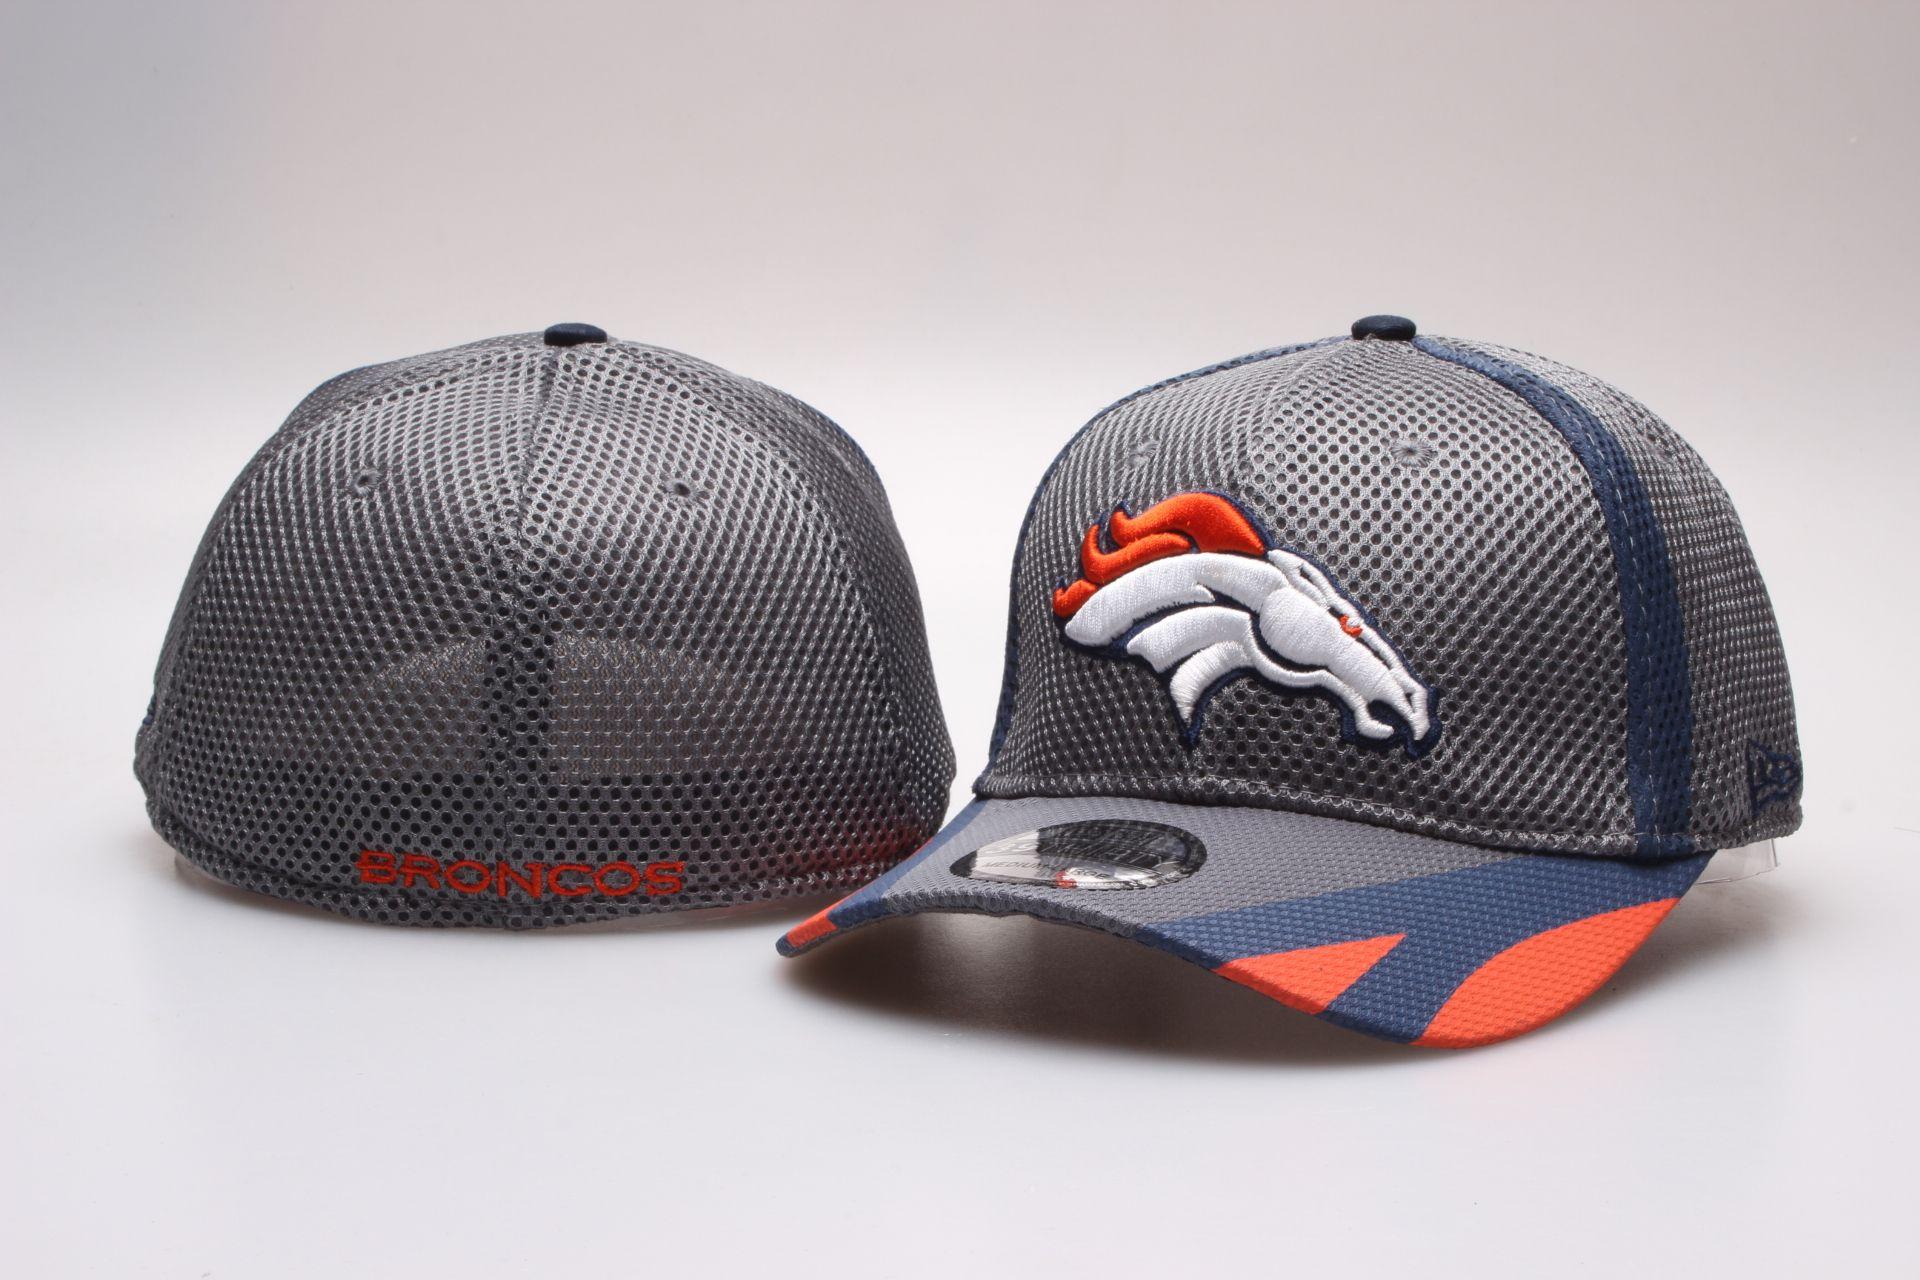 NFL Denver Broncos Team Logo Fitted Hat Peaked Cap Baseball Hats Mesh 671cf55d9